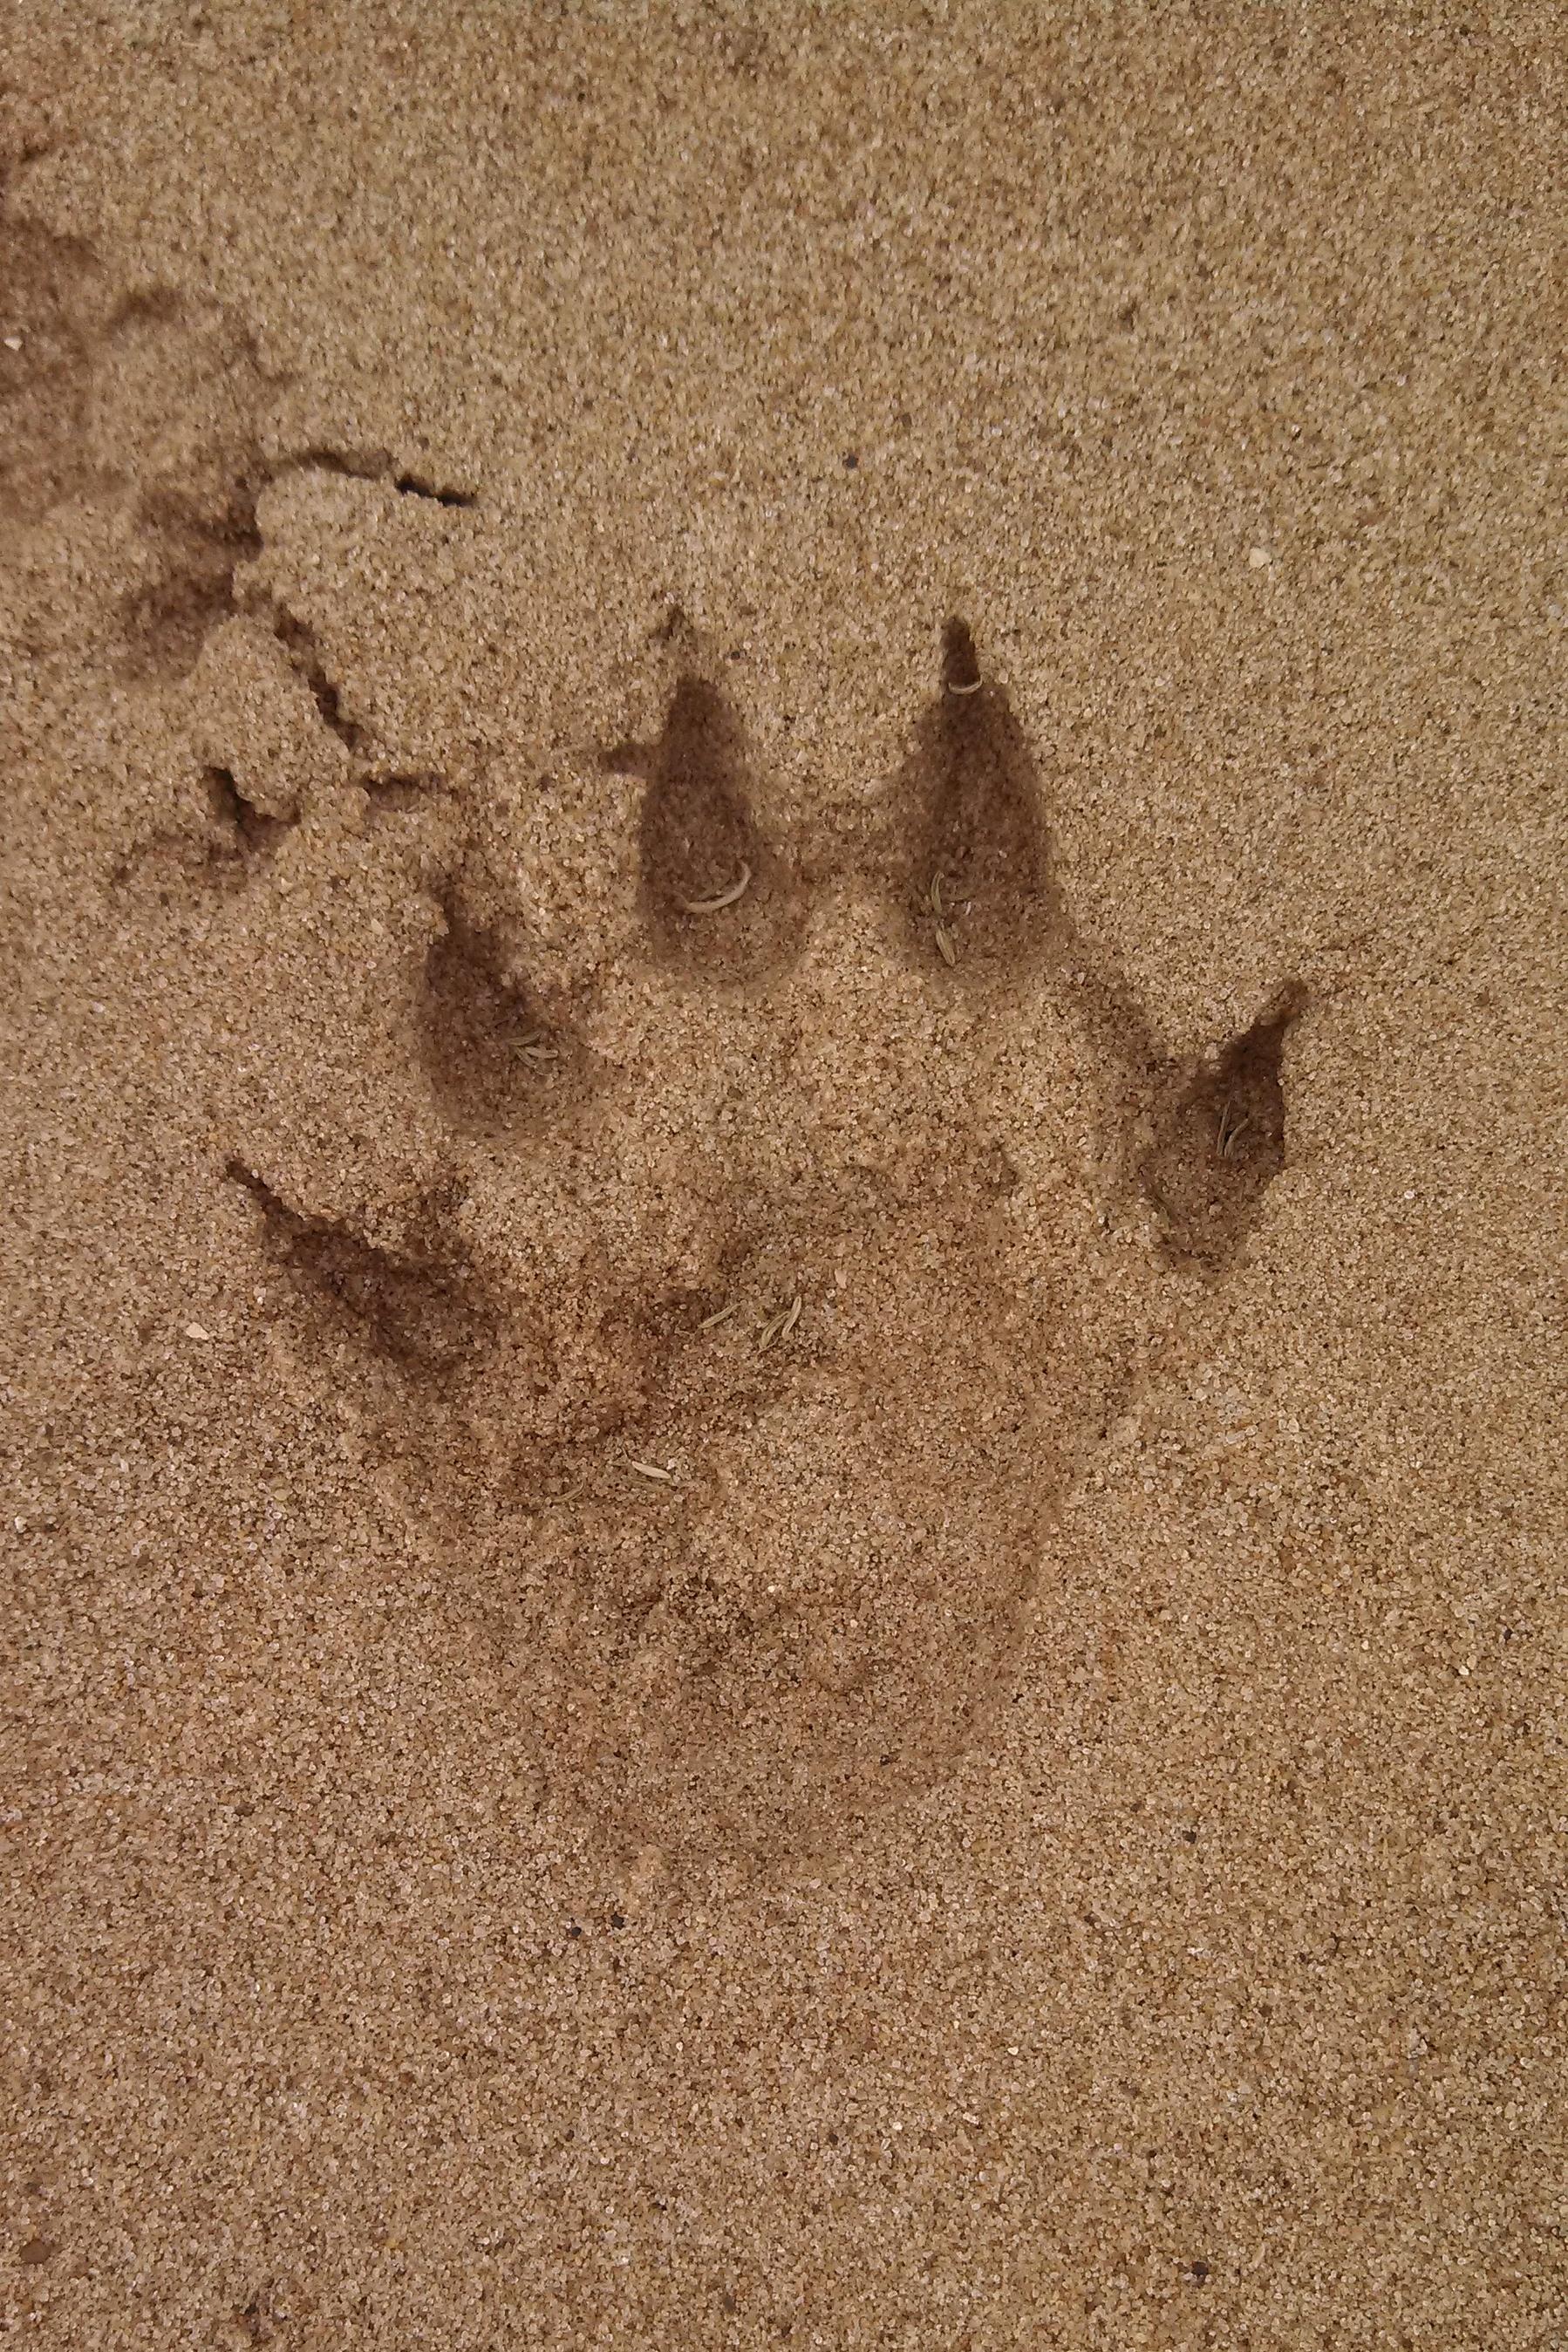 file north american river otter track  kings river  arkansas jpg